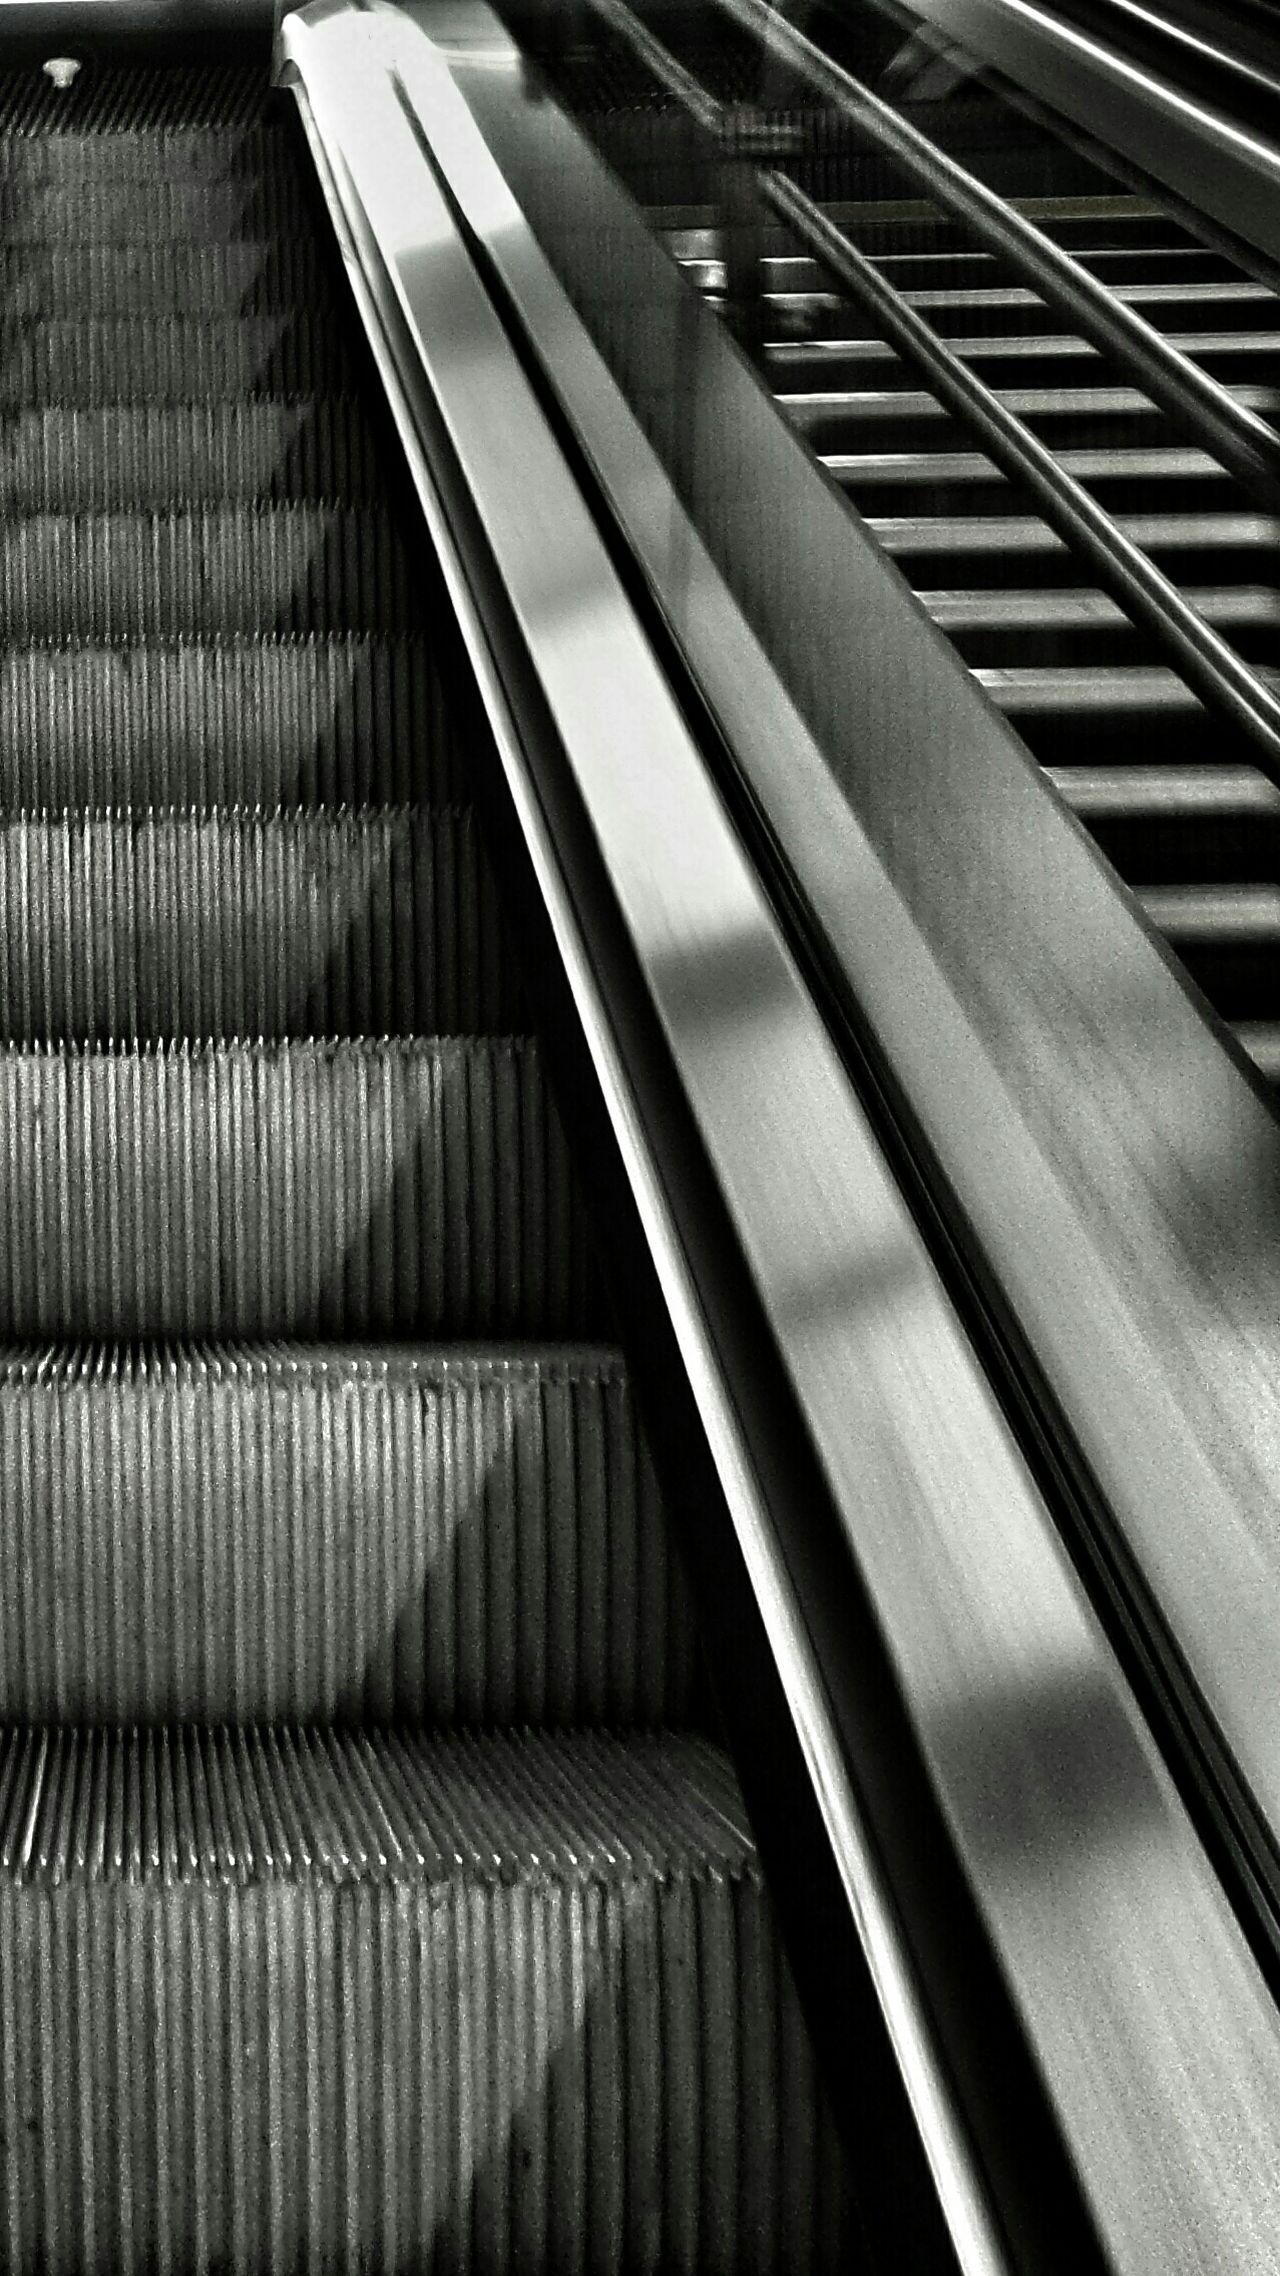 Up 👆 Bnw_friday_eyeemchallenge Escalator Notes From The Underground Urban Geometry Black And White Monochrome